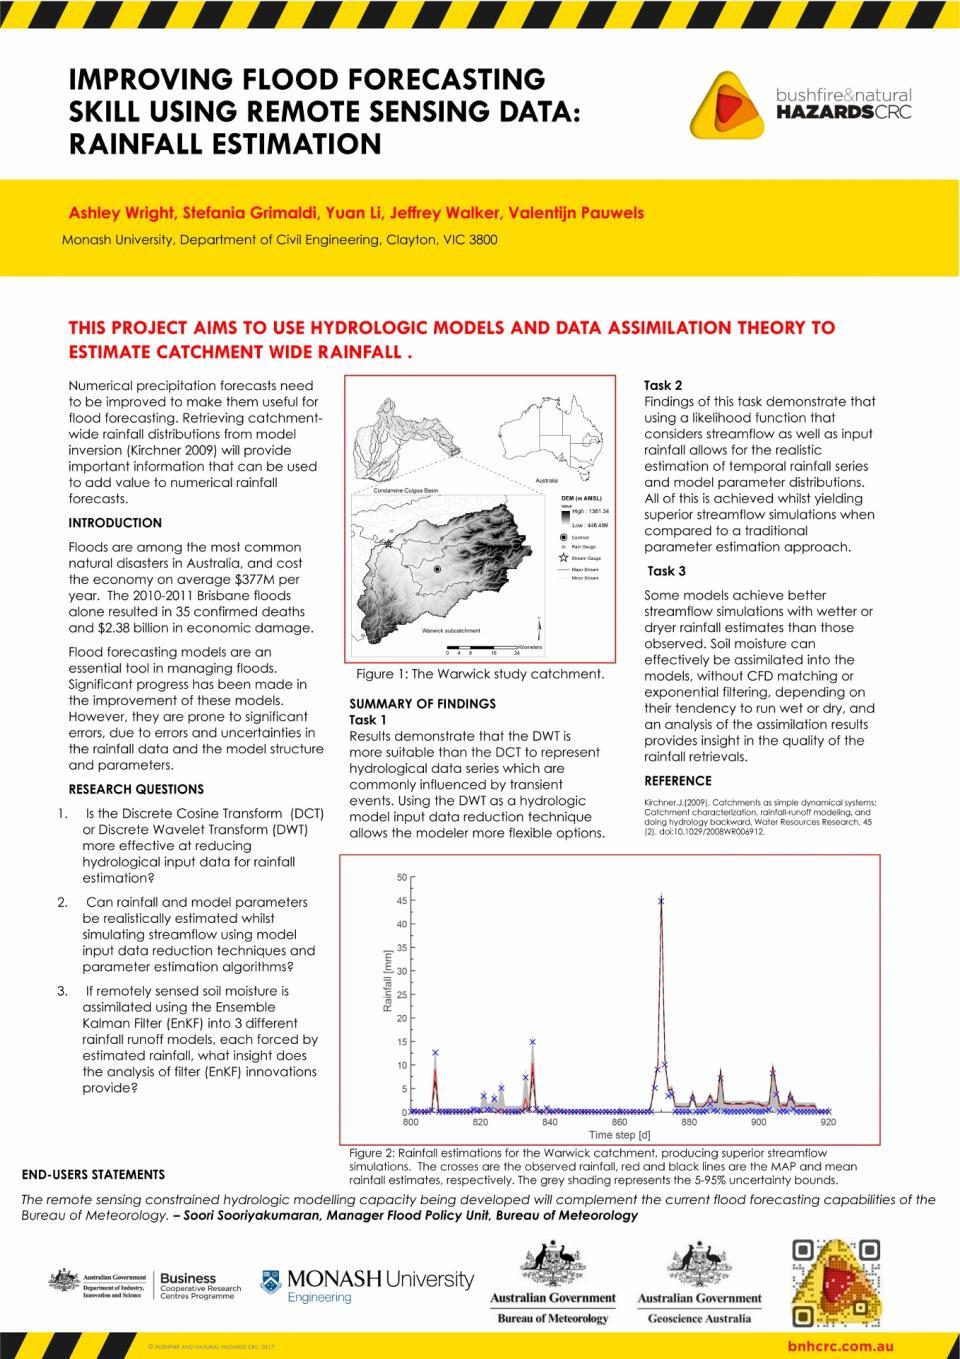 Improving flood forecasting skill using remote sensing data: rainfall estimation